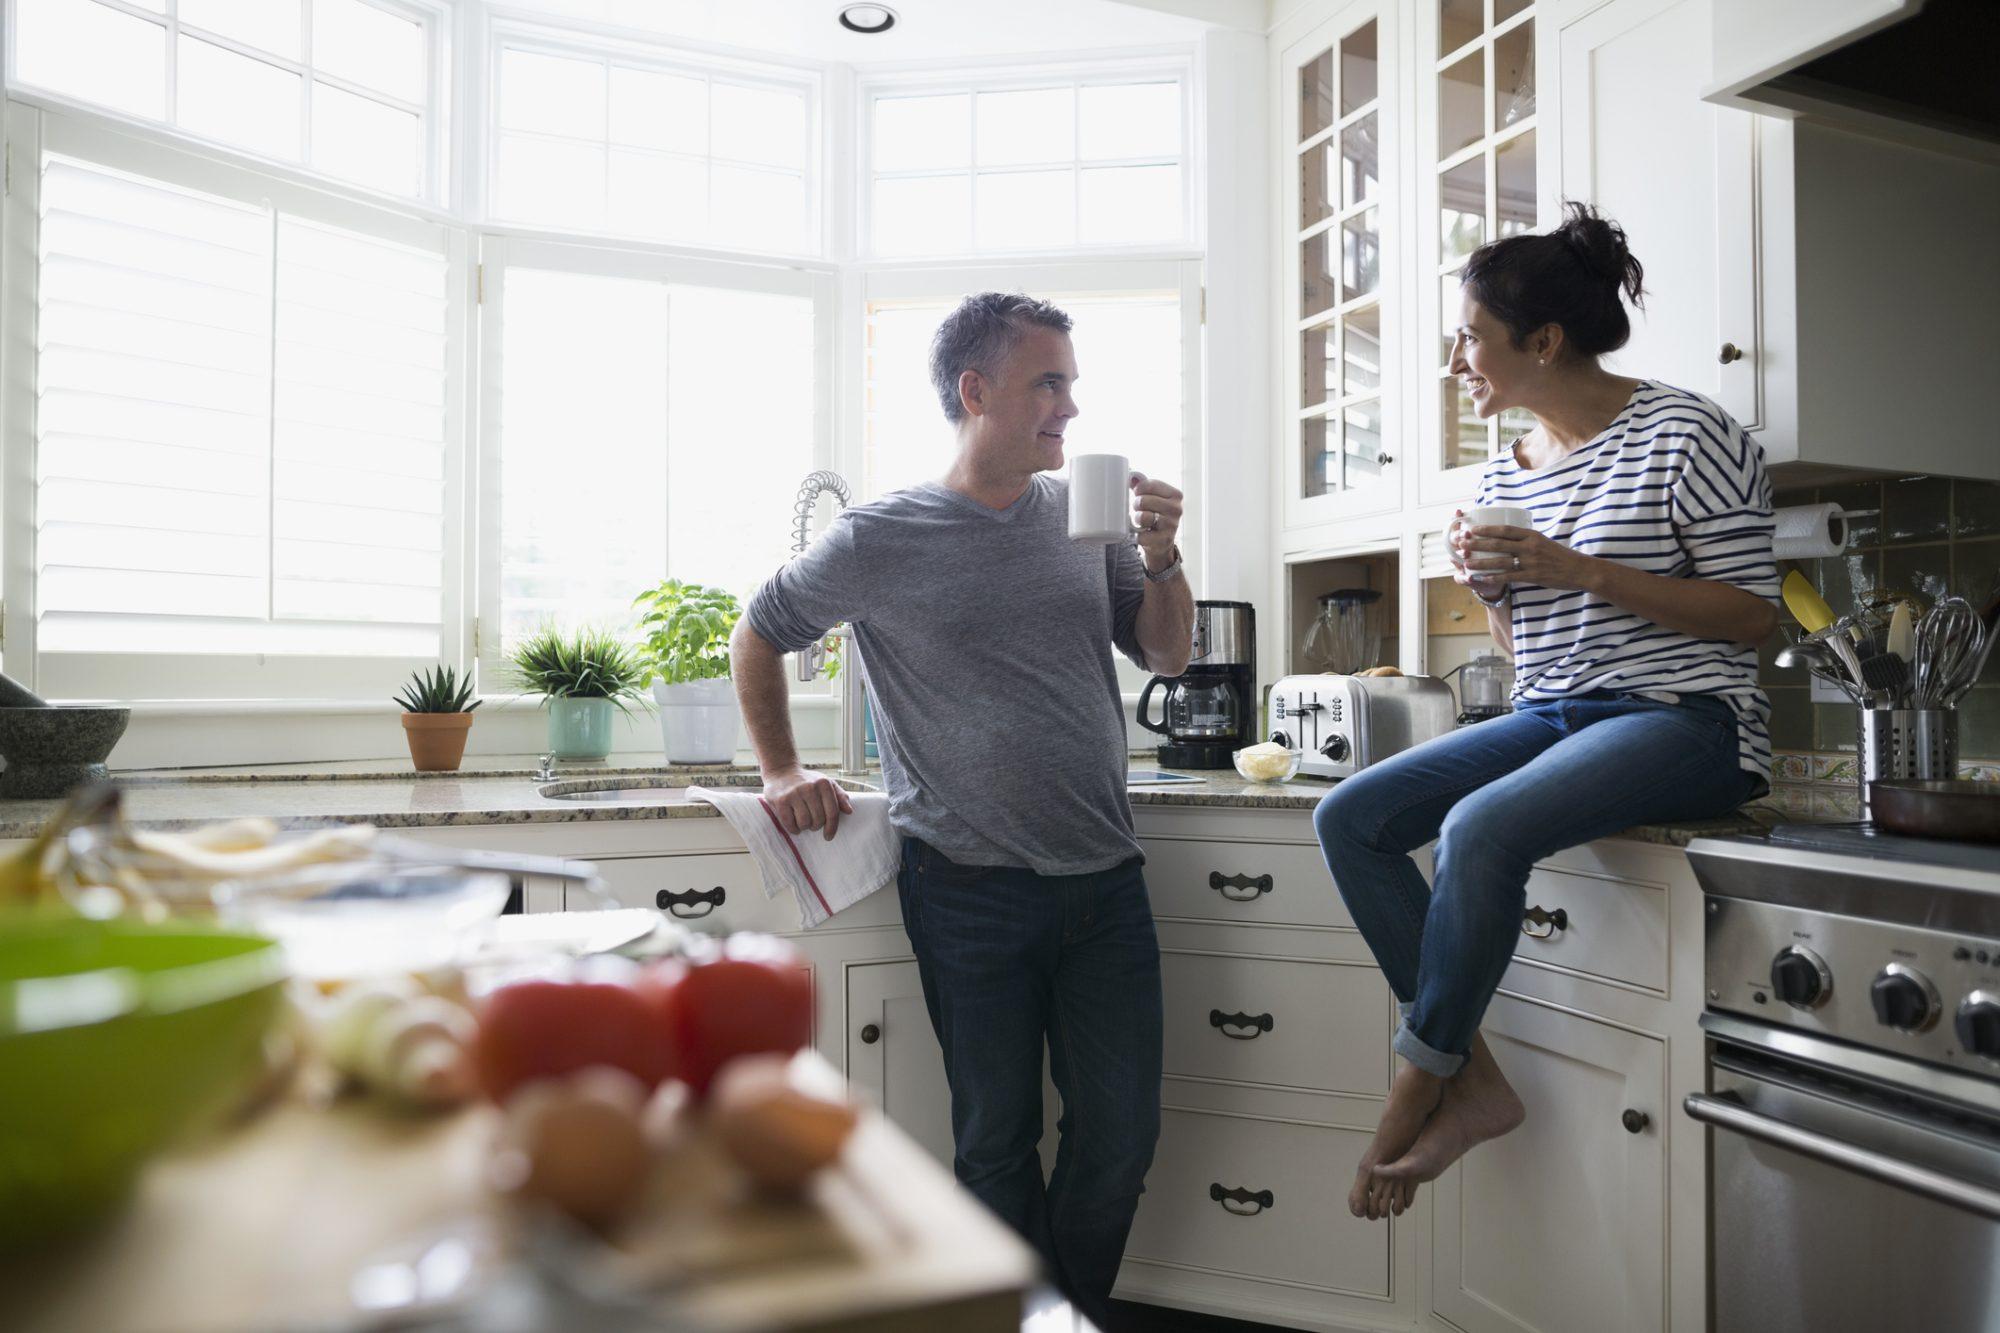 EC: Can Coffee Make You Smarter?